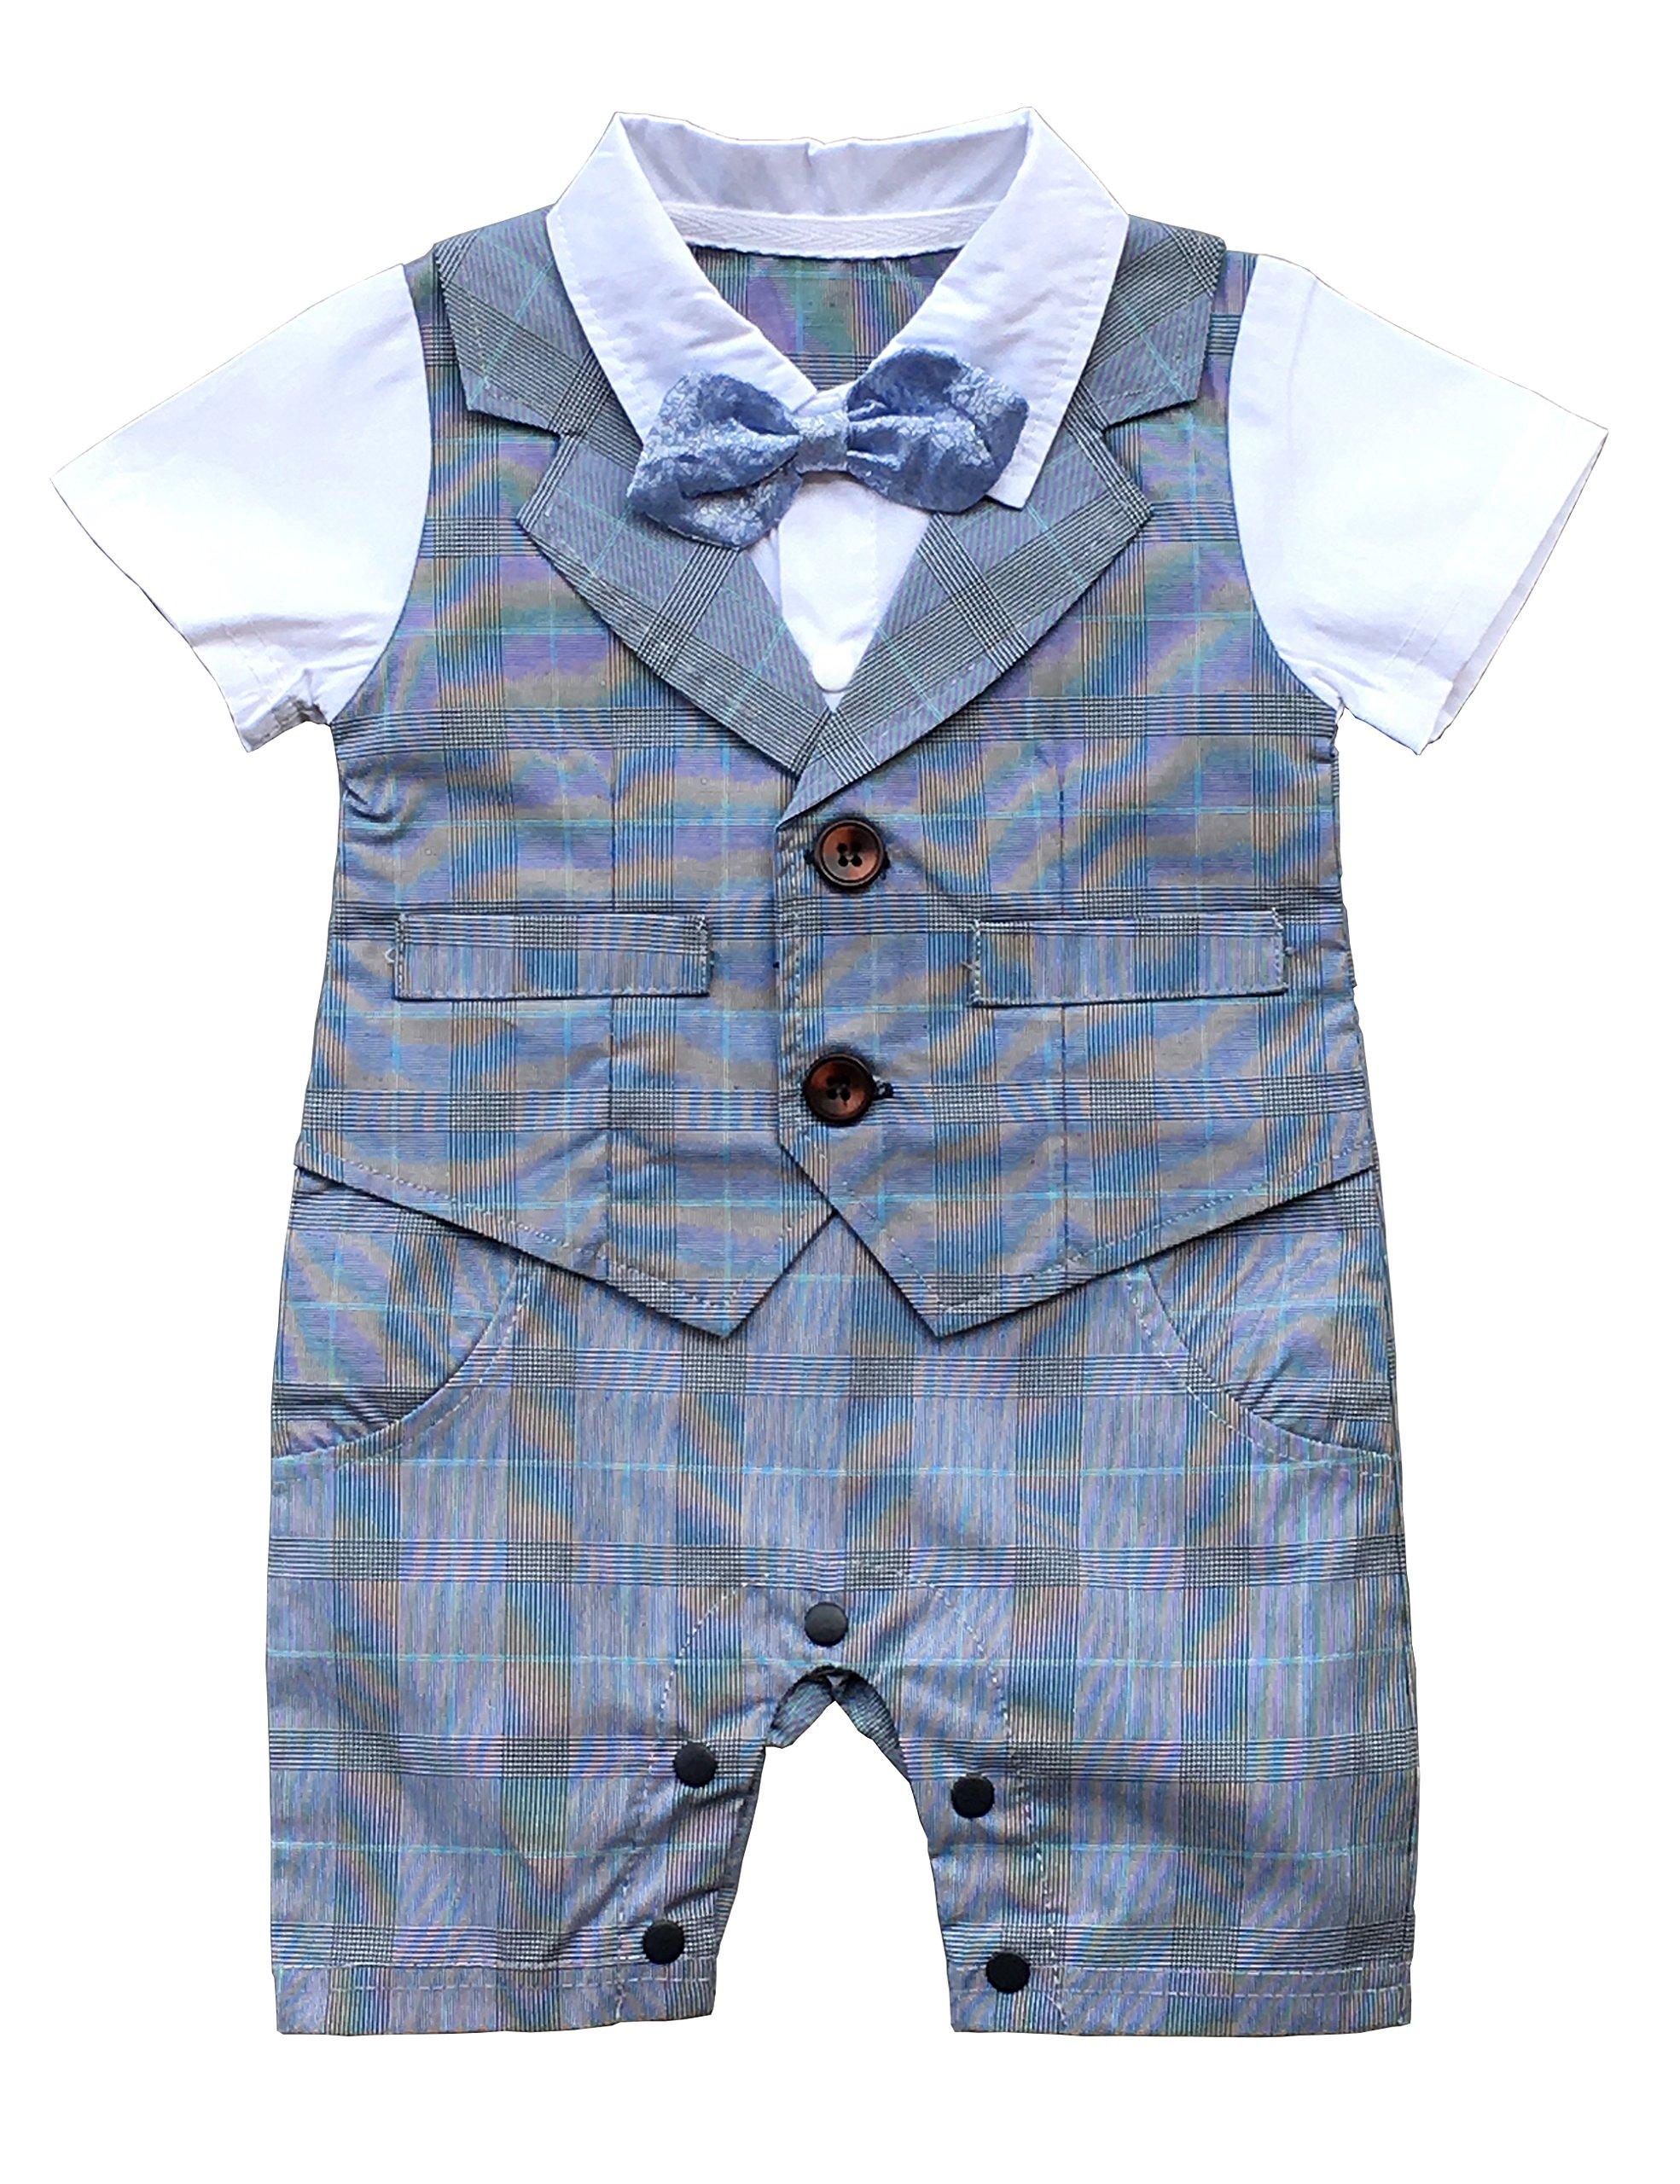 HeMa Island HMD Baby Boy Gentleman White Shirt Bowtie Tuxedo Onesie Jumpsuit Overall Romper with Blue Waistcoat (Grey, 6-9 M) by HeMa Island